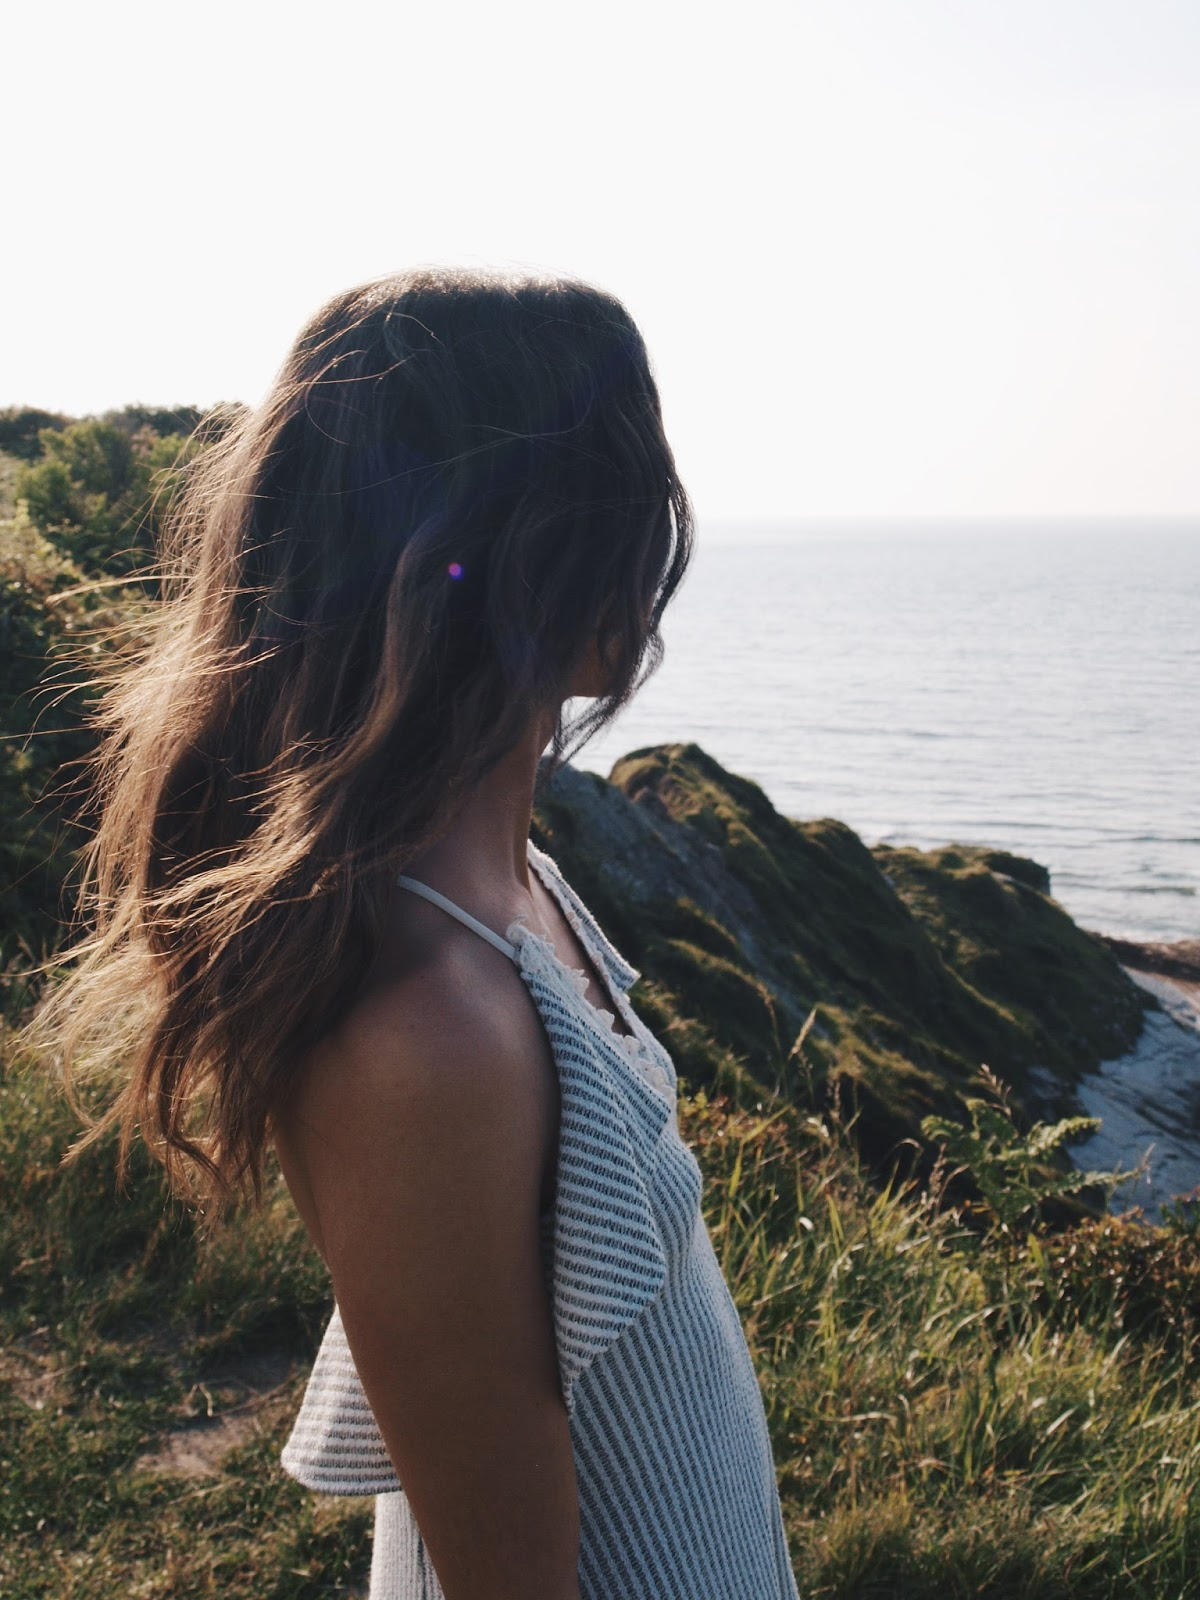 hendaye-corniche-chateaudabbadia-coastalandco-blog-blogger-gipsy-fashion-zara-dress-bohemian-wild